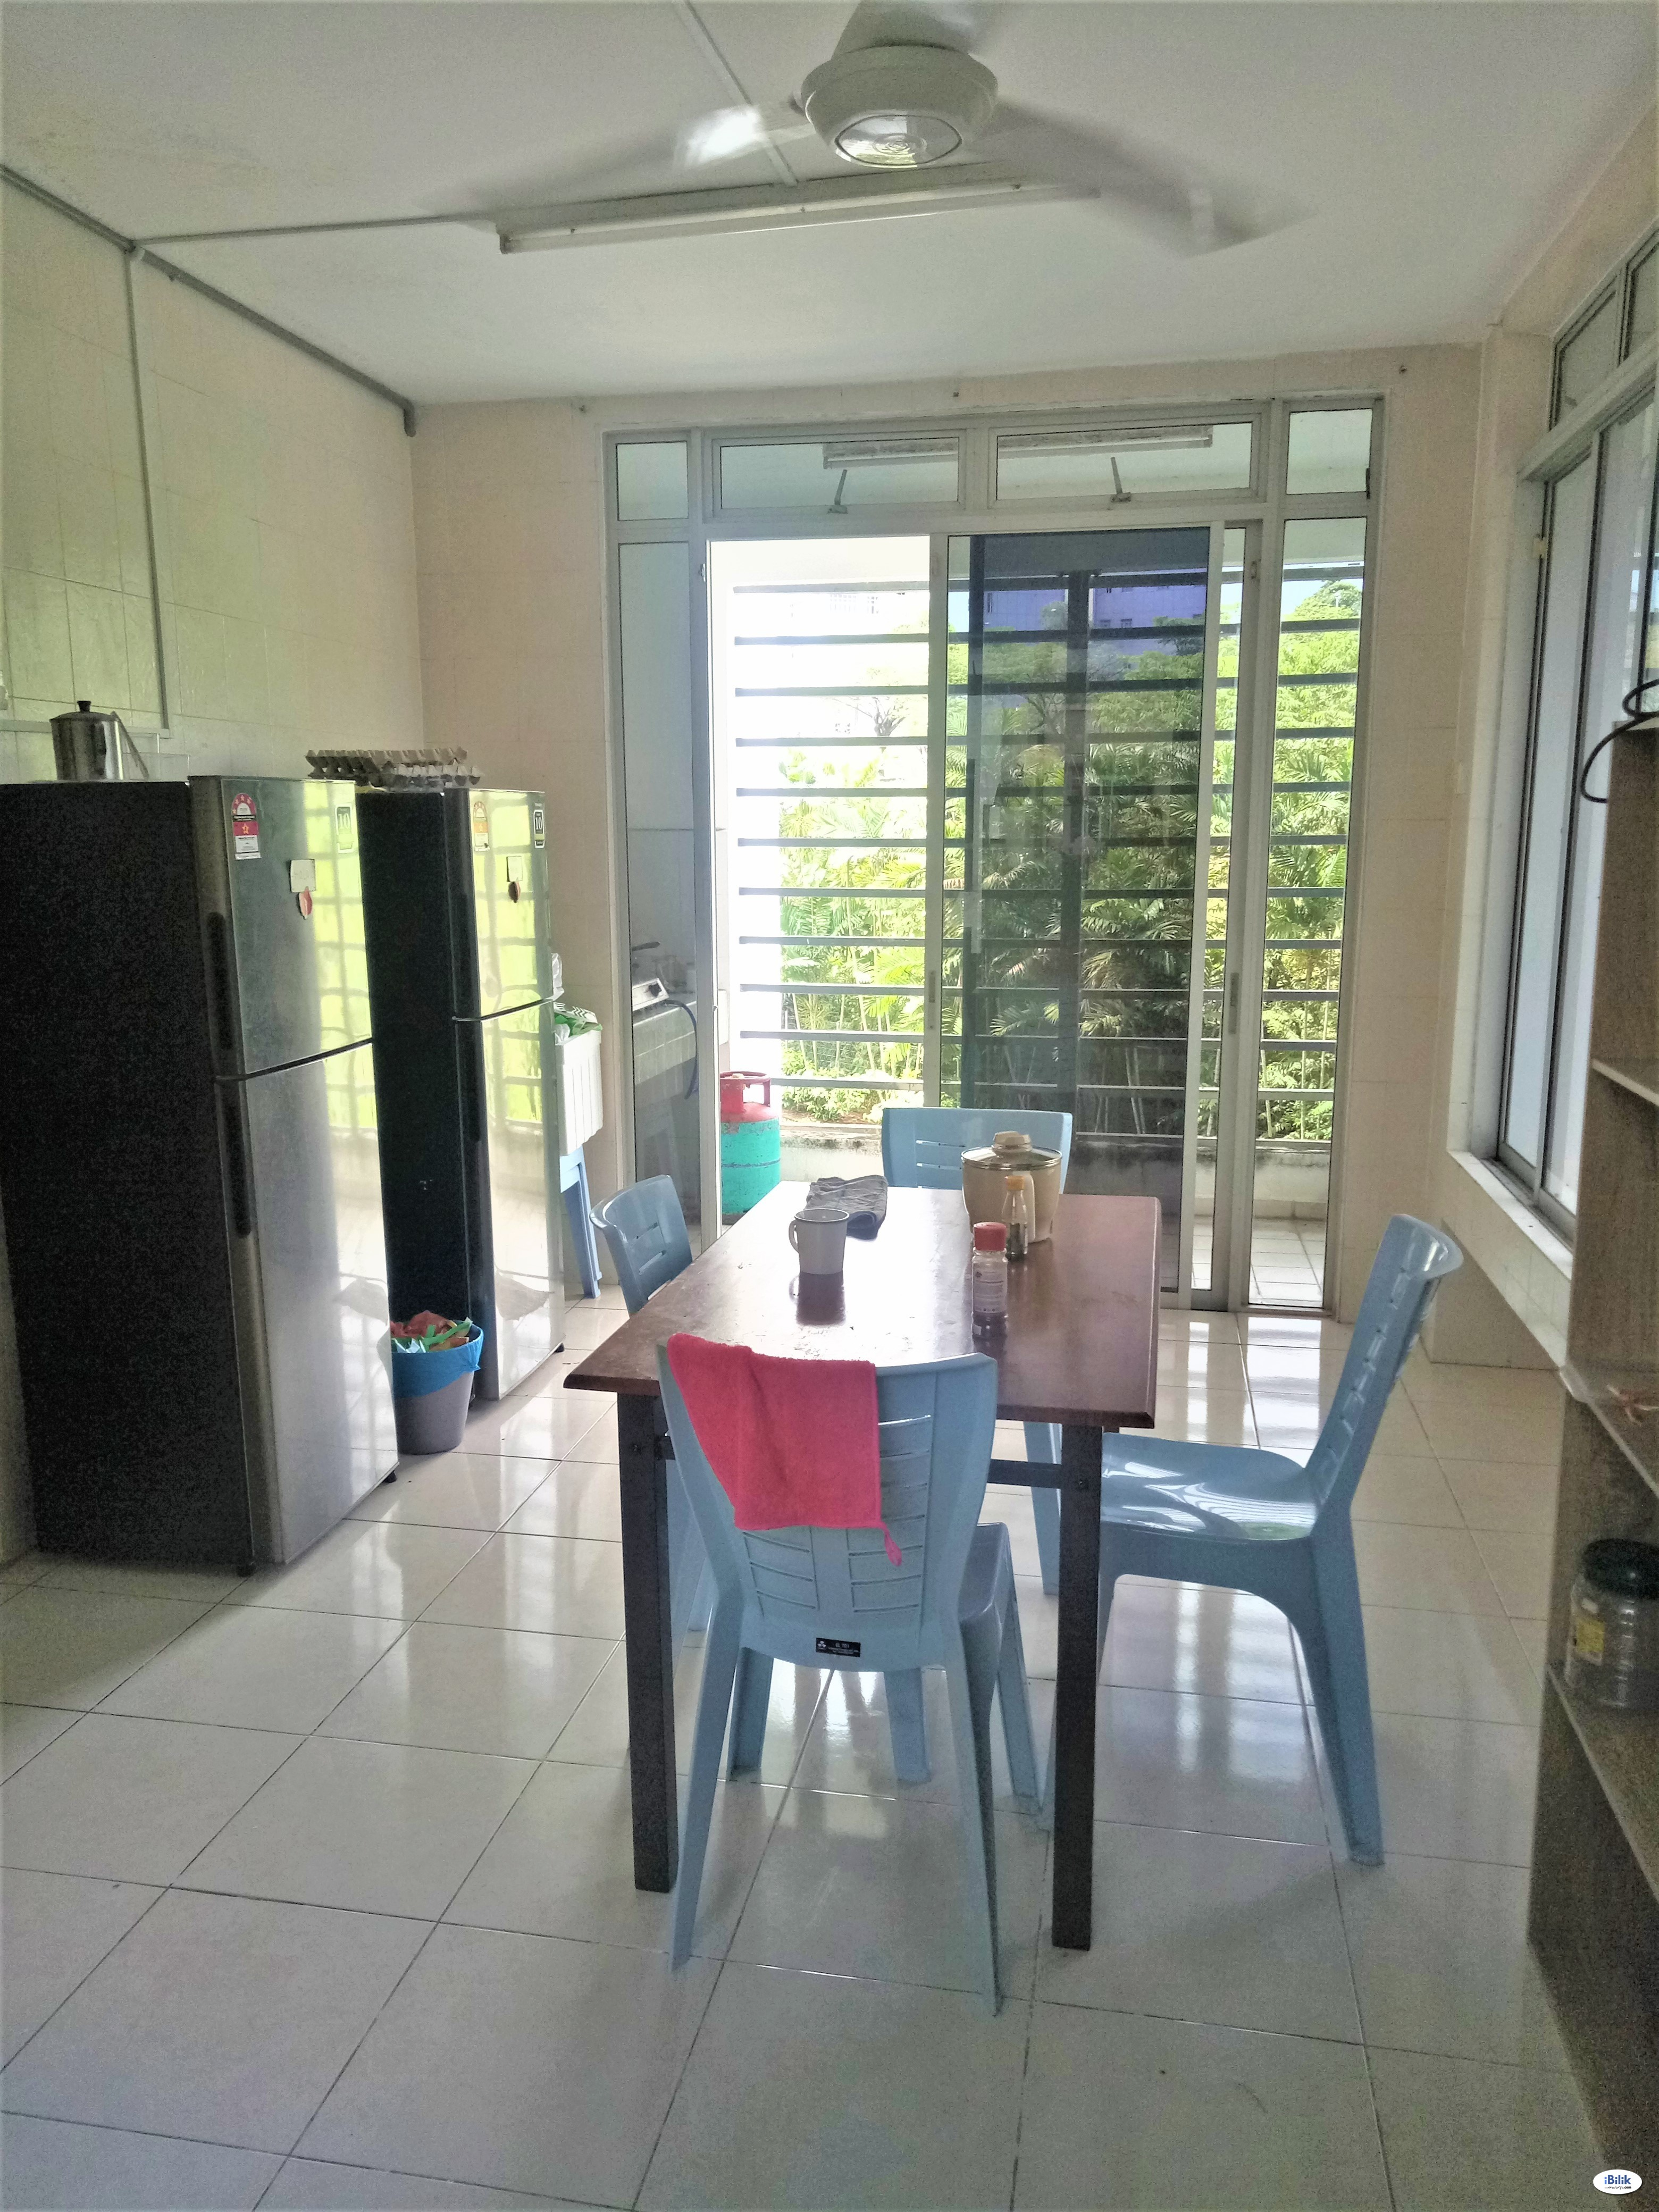 Small room with big French Window at Cyberjaya, Selangor